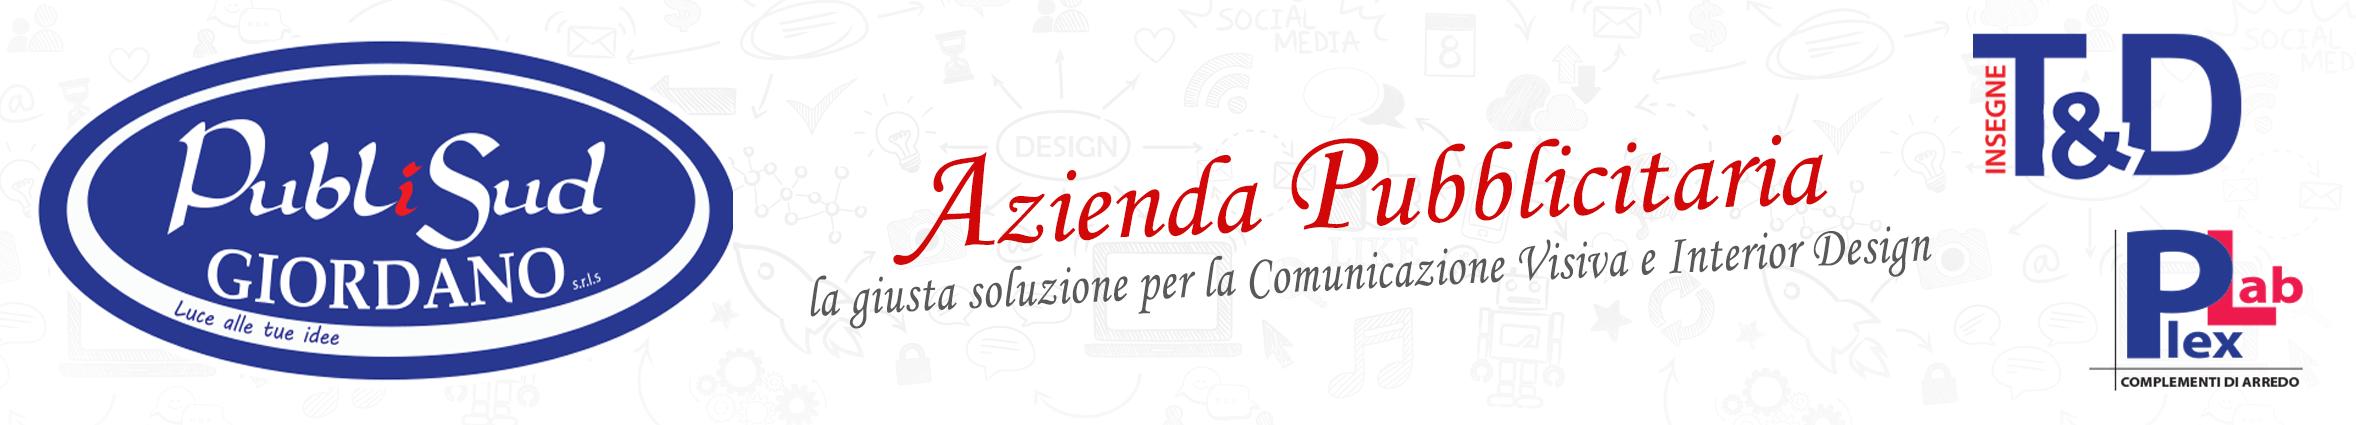 Publisud Giordano